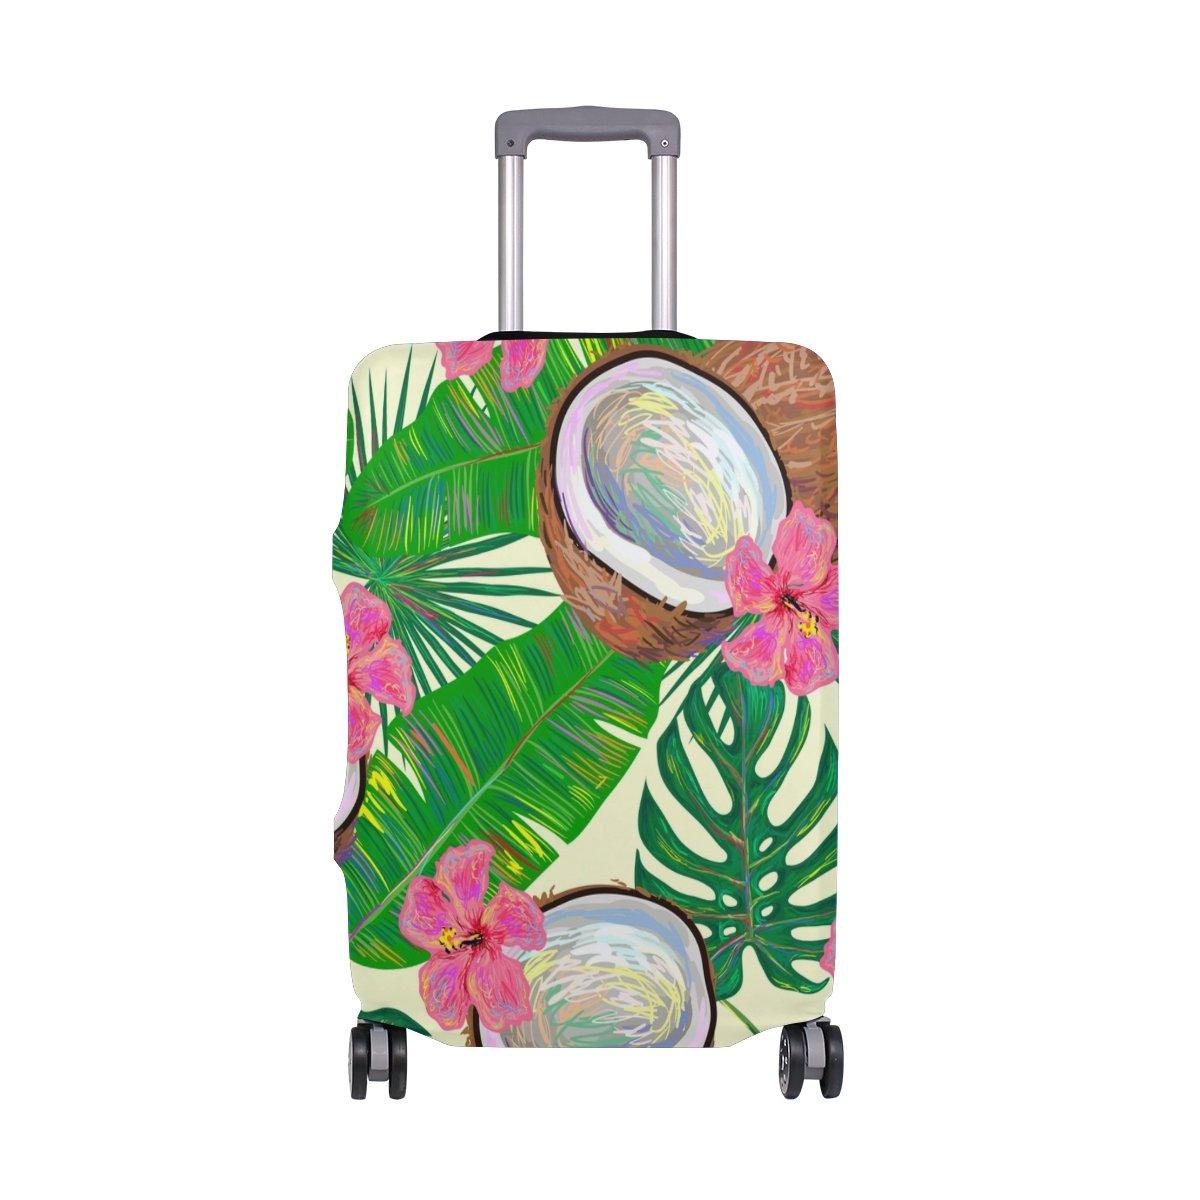 suabo旅行荷物カバーFits 18 – 20インチスーツケースwith Coconutsと花プリントスーツケースカバー L 26-28 in  B07FS9PM7F